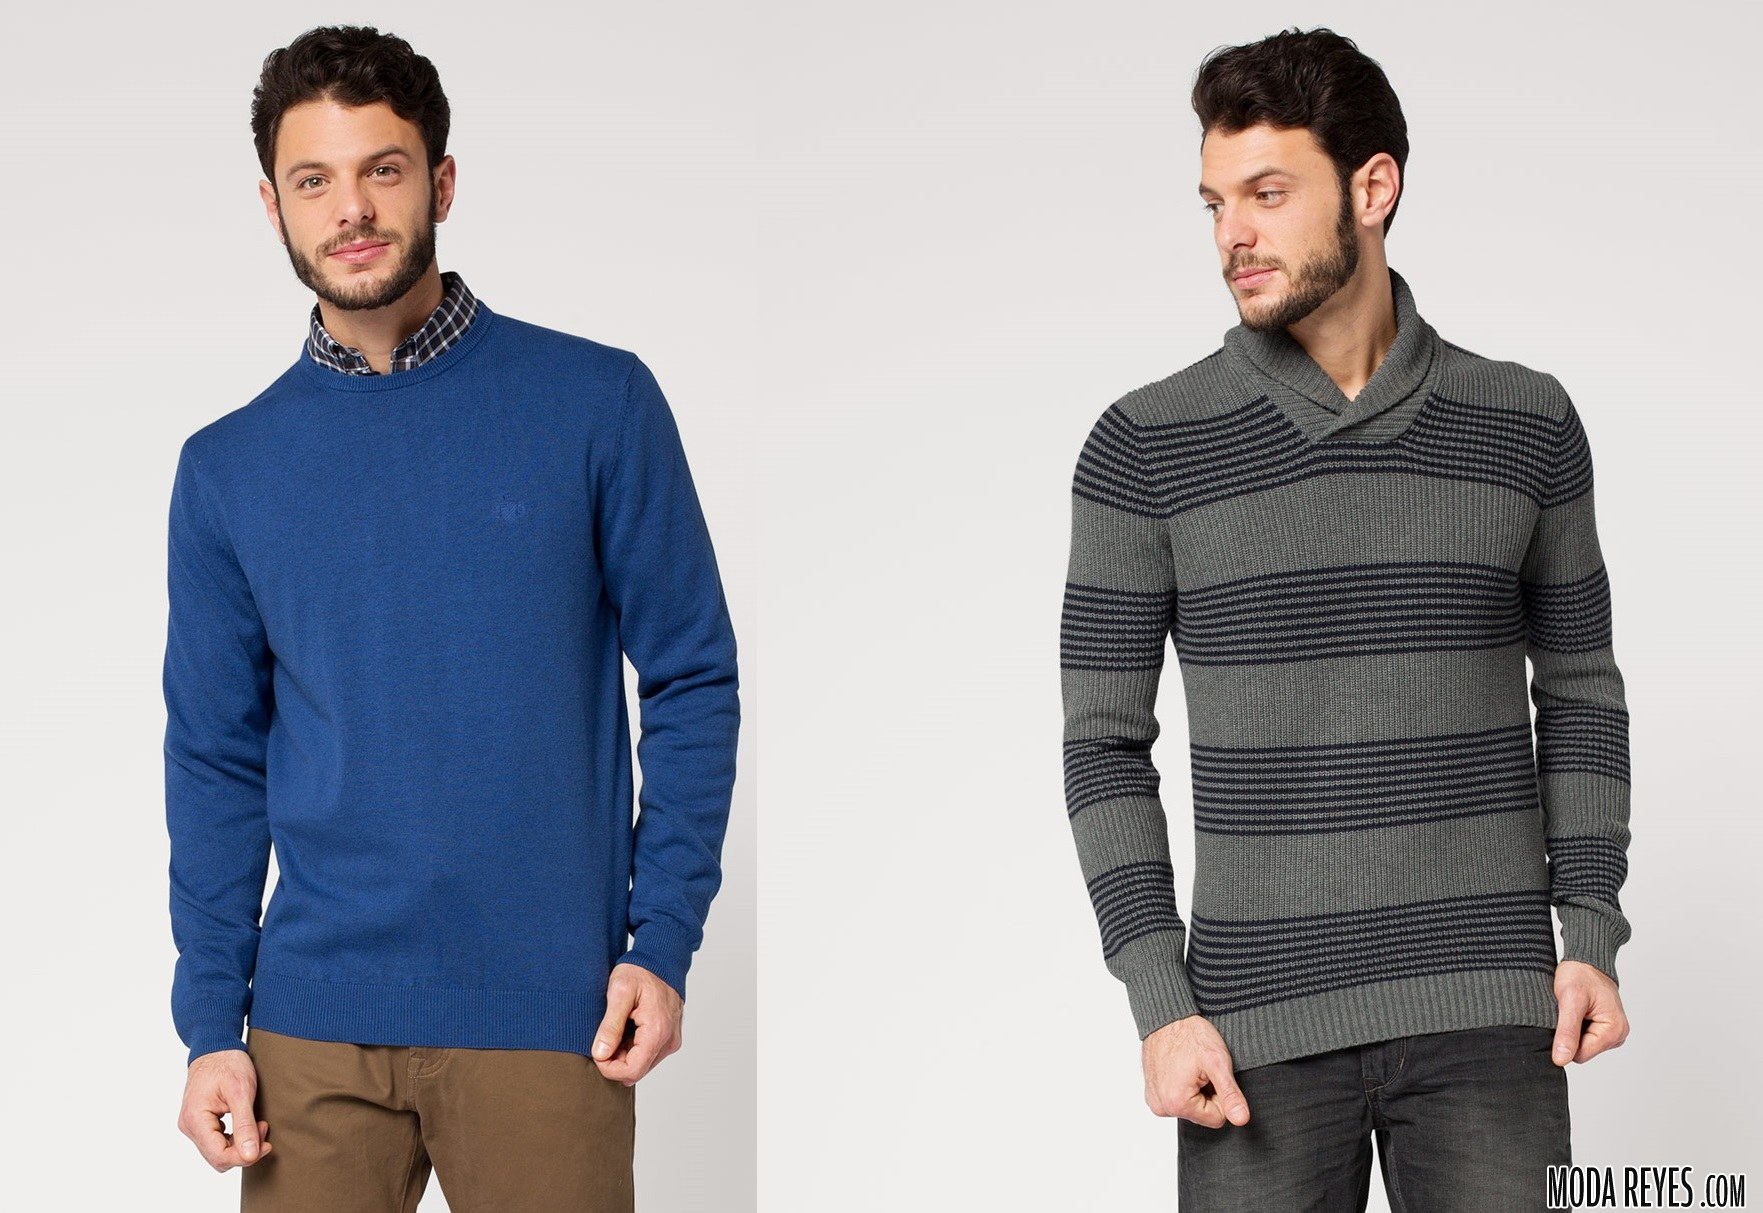 jerséis de moda invierno 2015